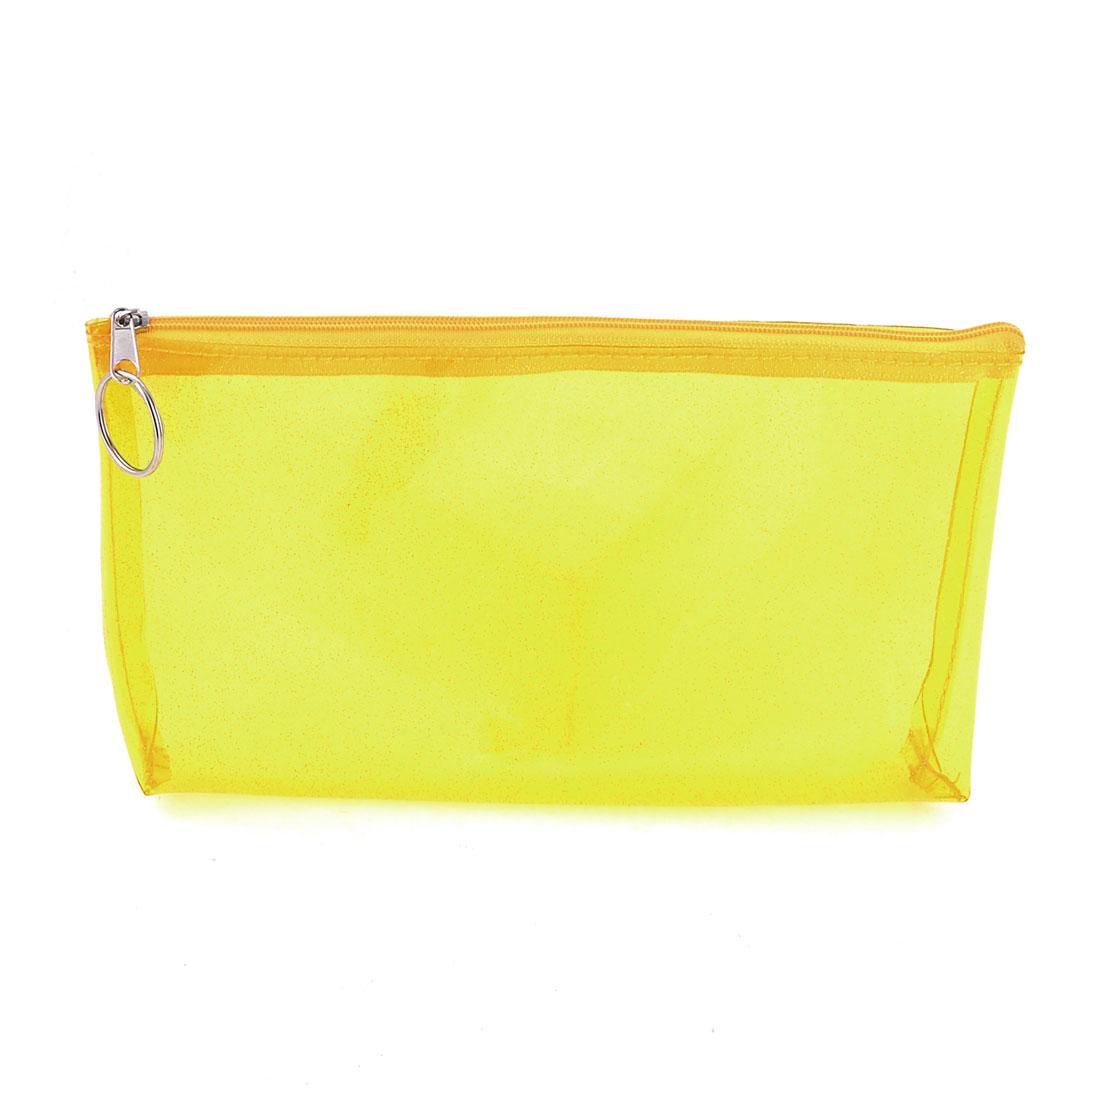 Lady Glitter Yellow Clear Plastic Zipper Closure Makeup Cosmetic Bag Case